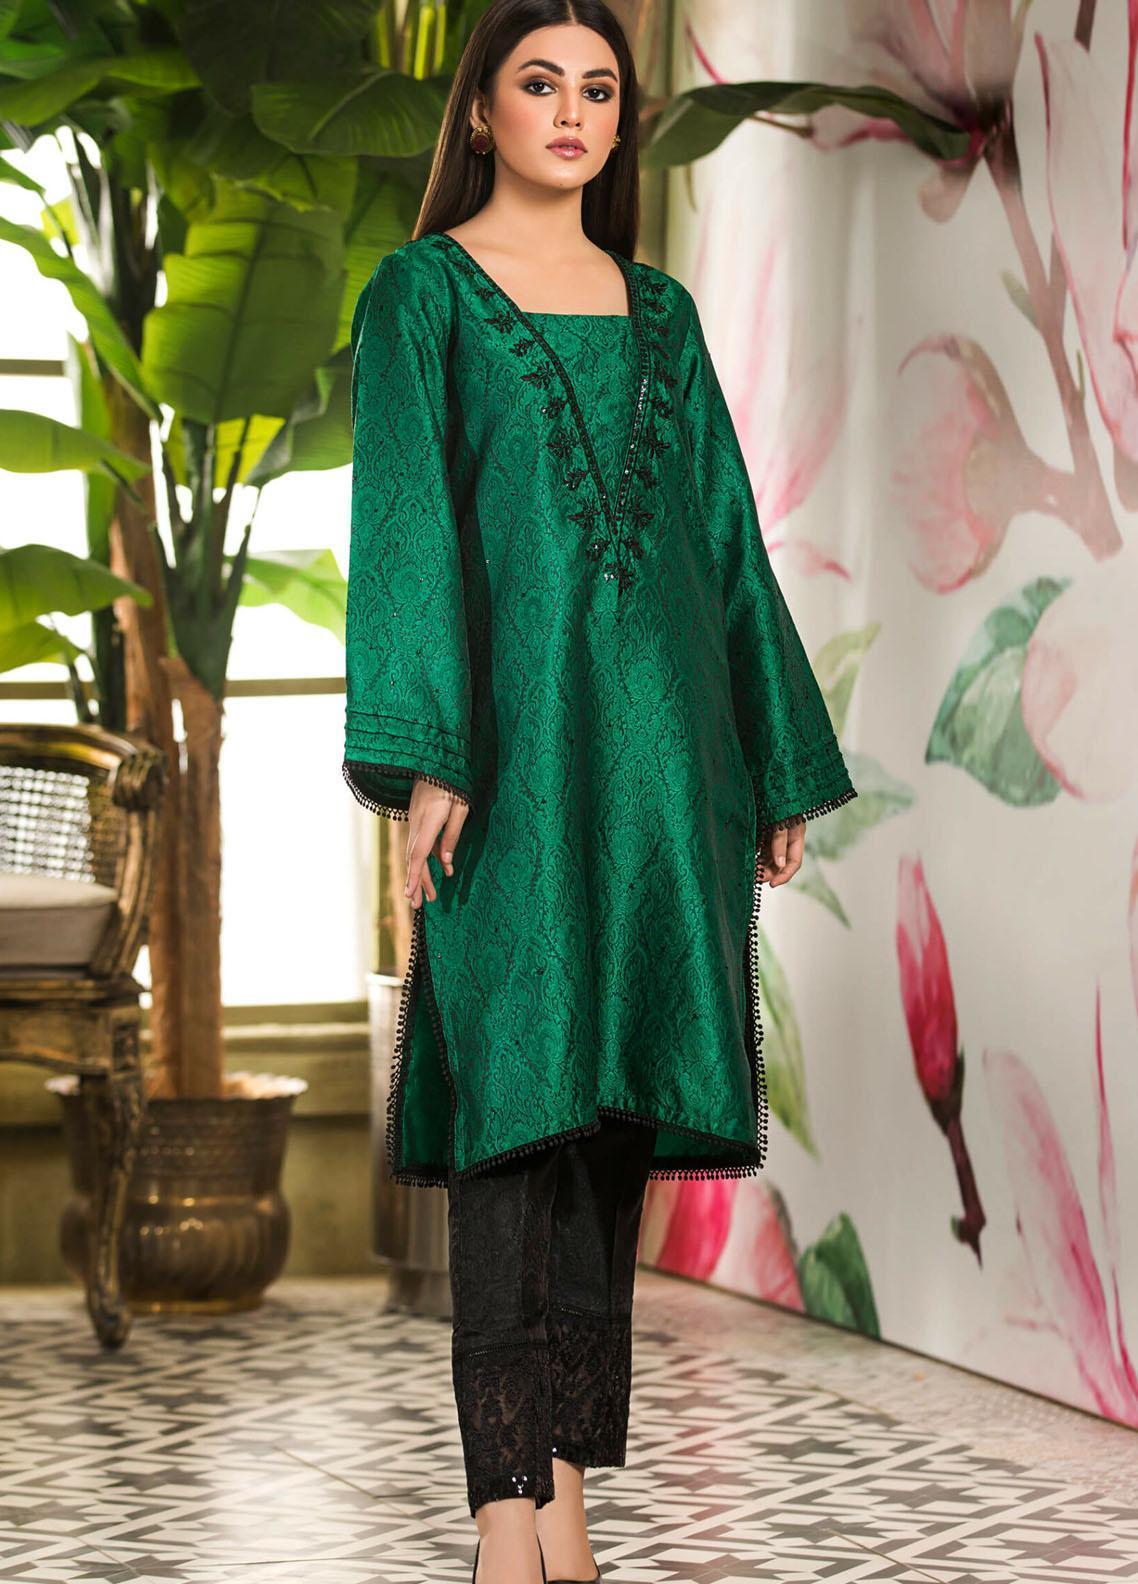 Kross Kulture Embroidered Jamawar Stitched Kurtis KK21C Green KE-20734